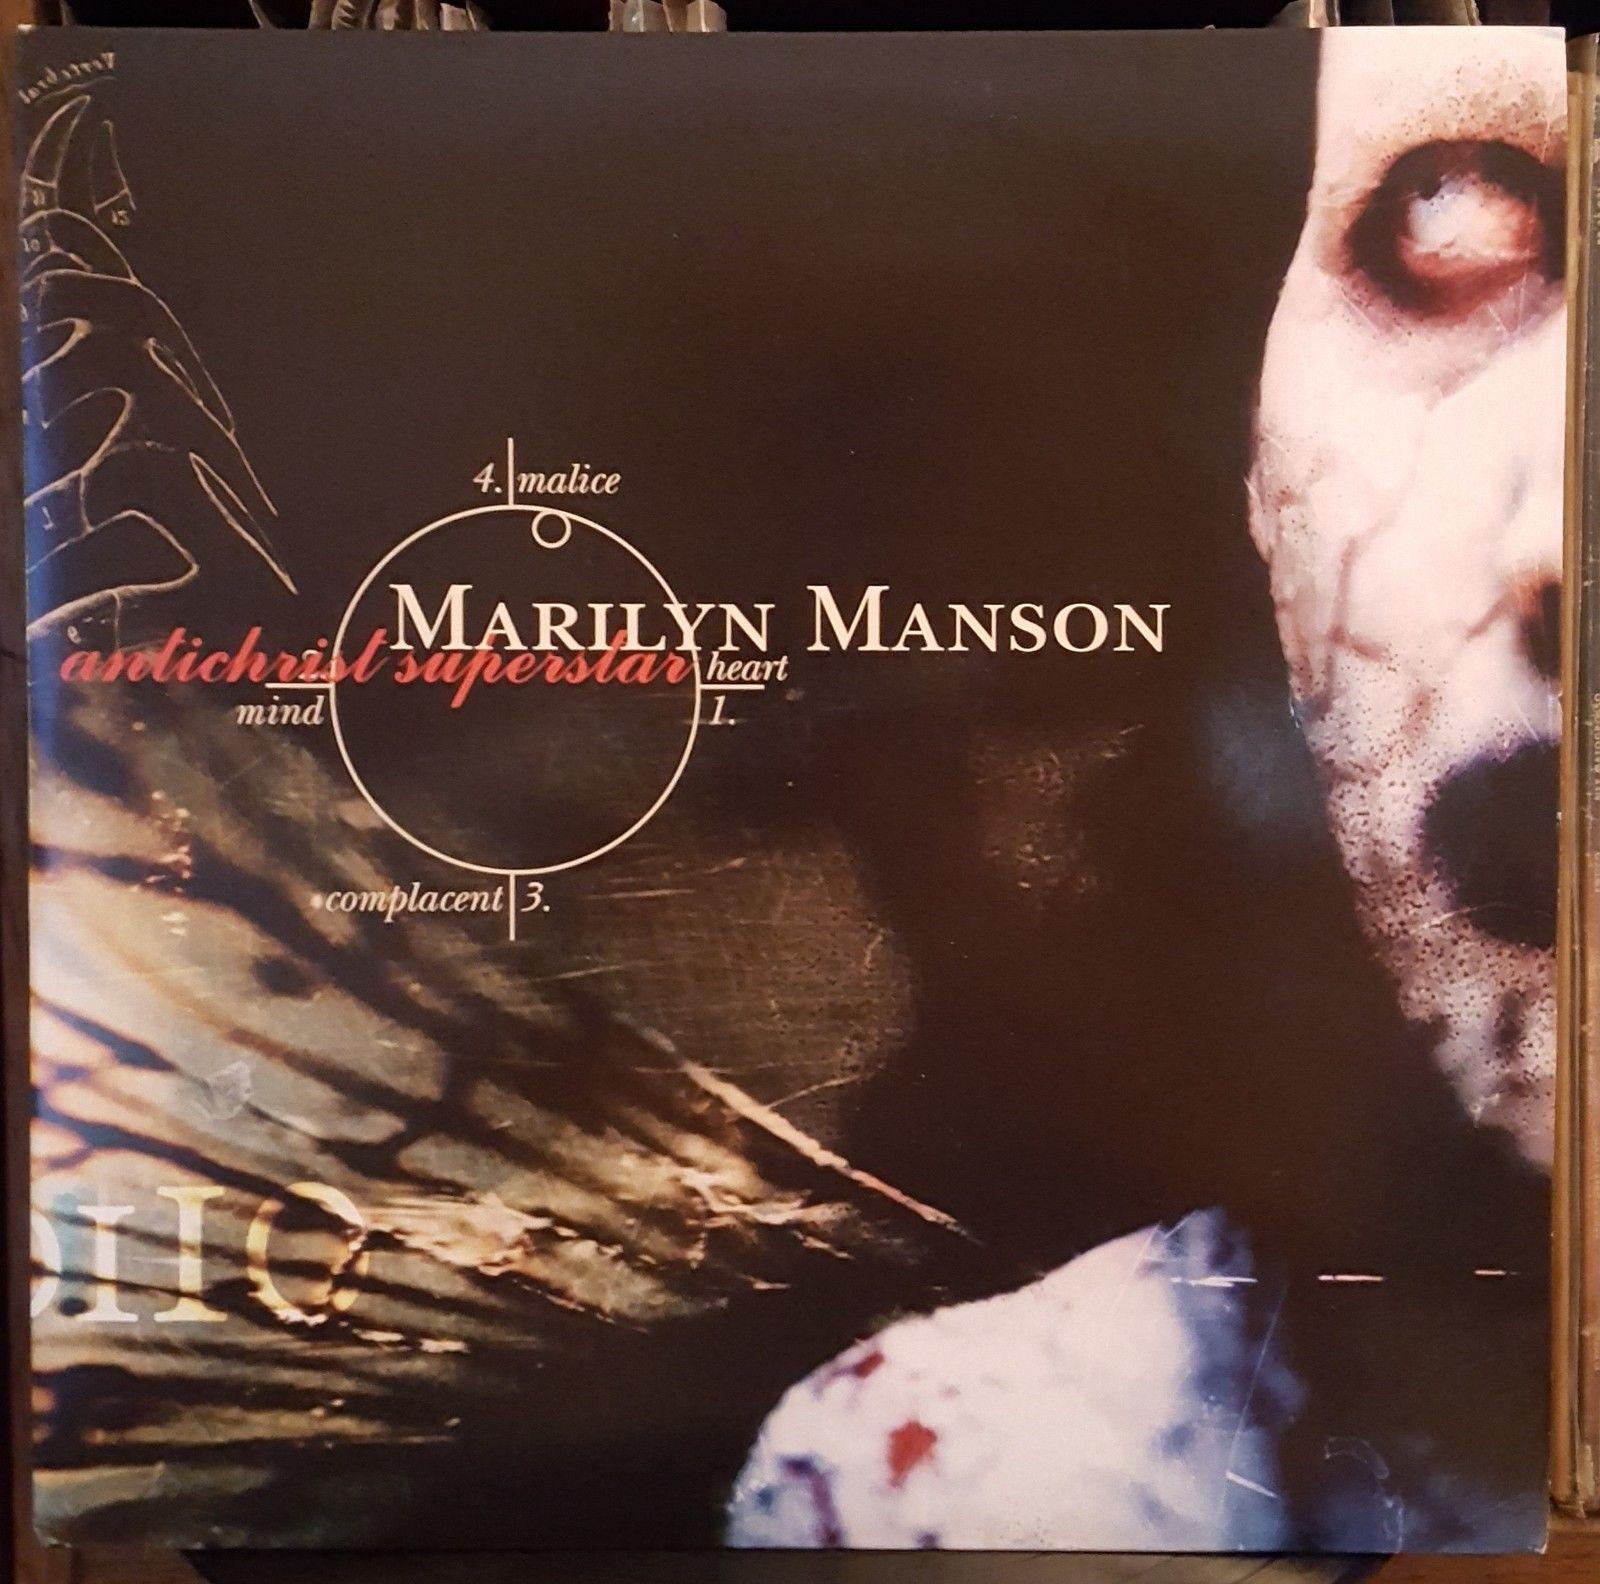 Marilyn Manson Antichrist Superstar Hot Topic Red vinyl Edition LP vinil OOP